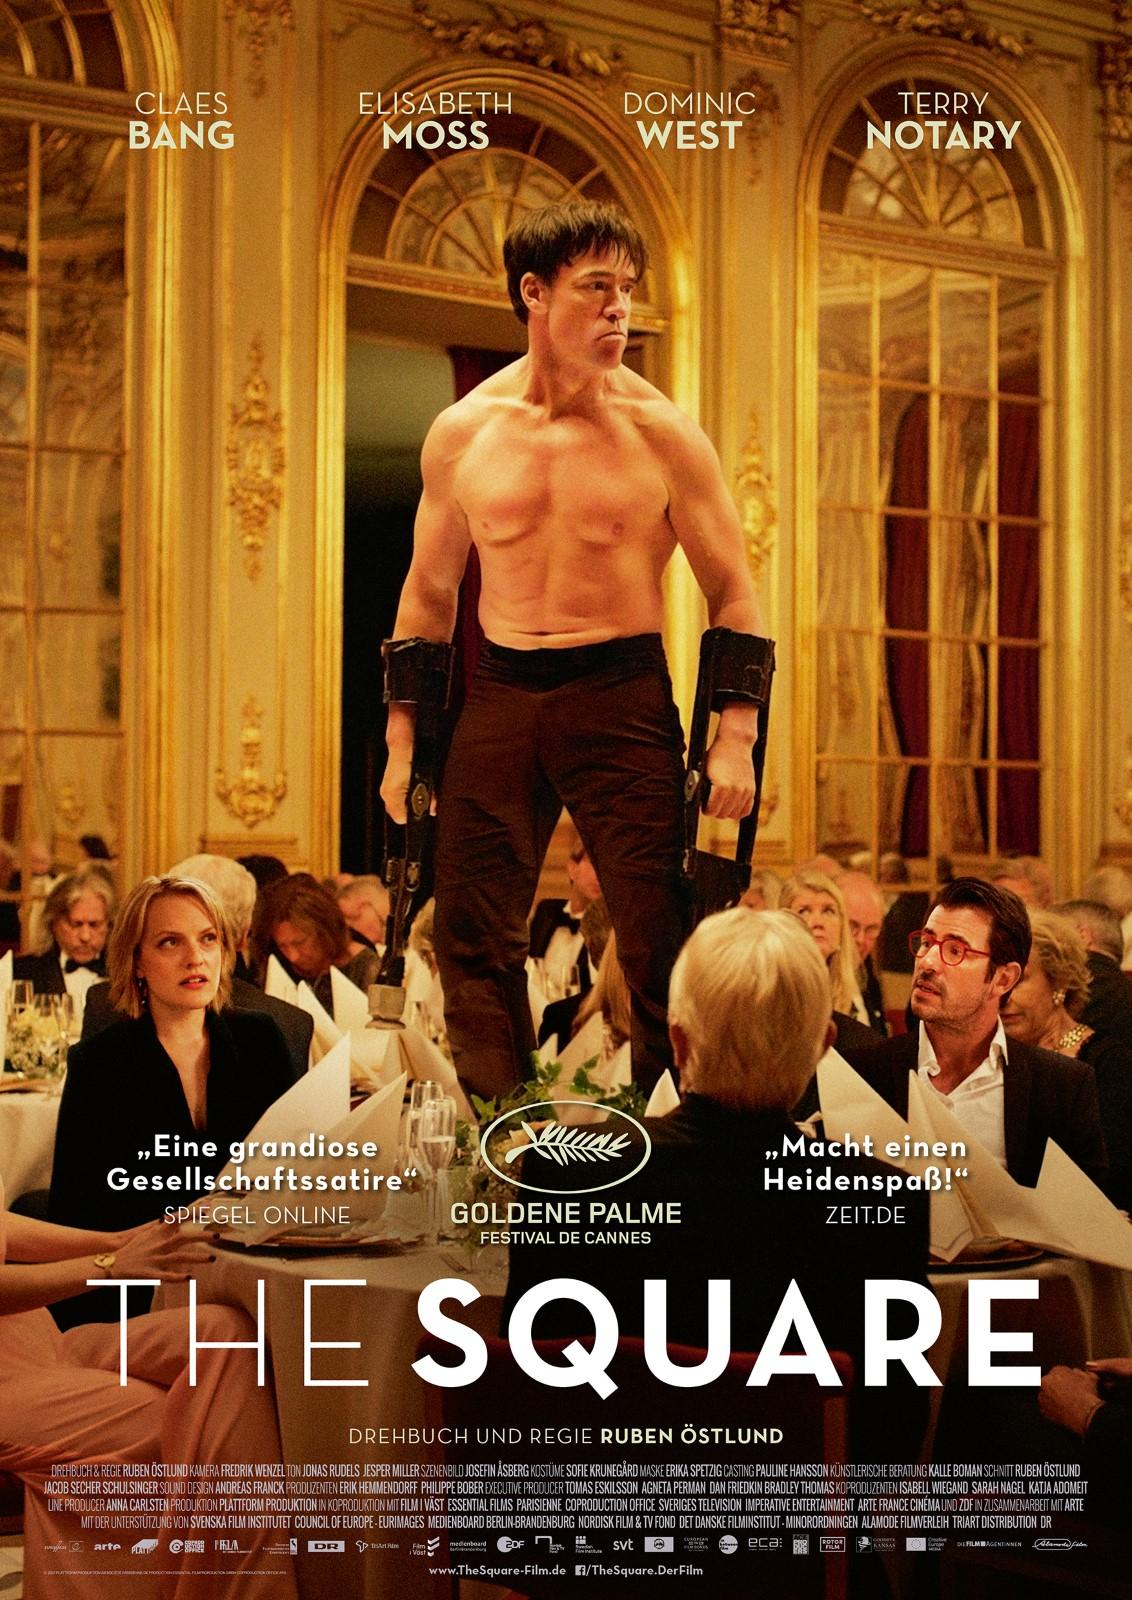 The Square - kostenlos im Stream [Arte Mediathek ab 17.05]